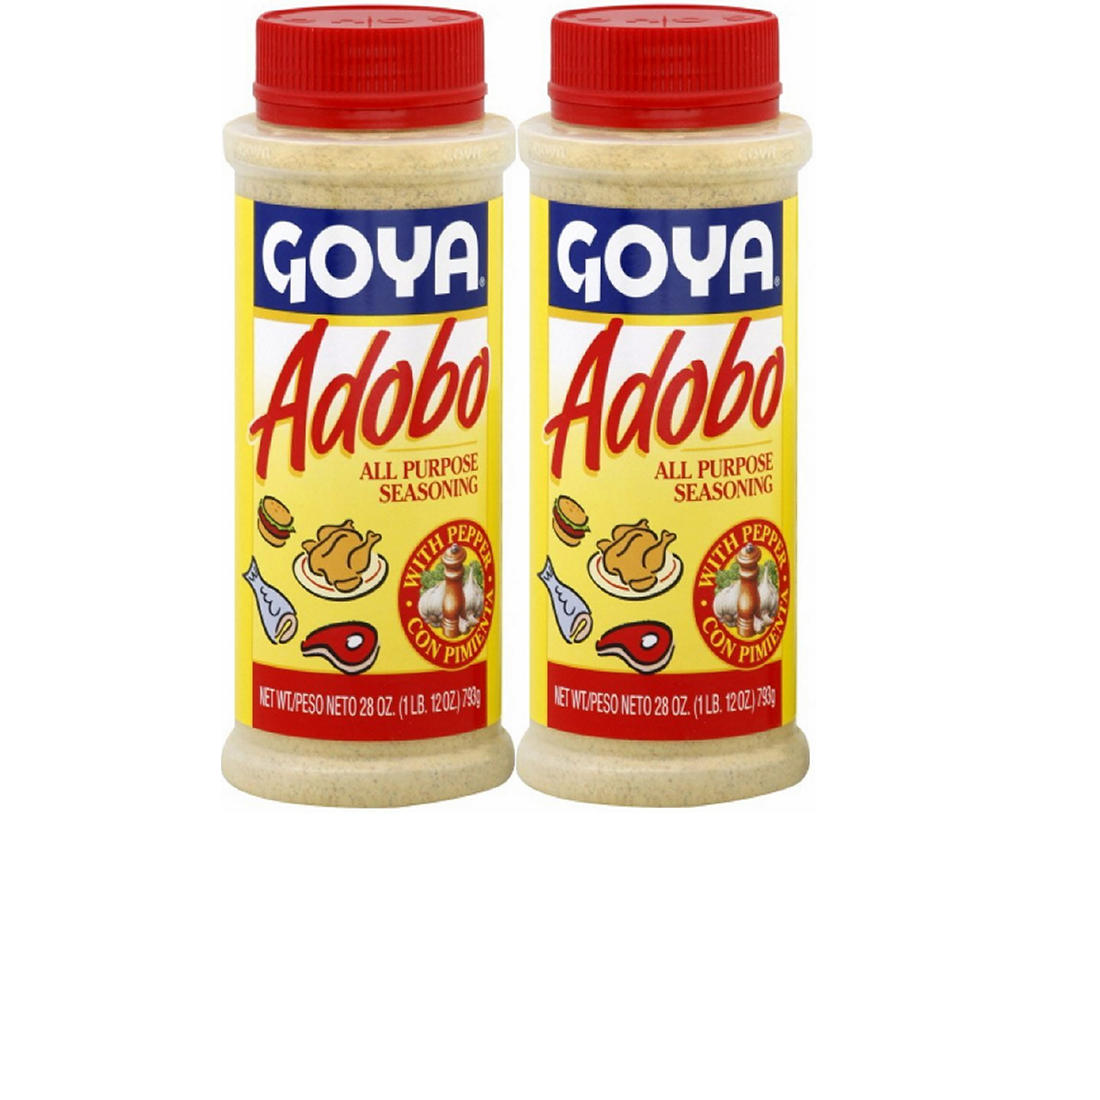 Goya Adobo All-Purpose Seasoning, 2 pk /28 oz  - BJs